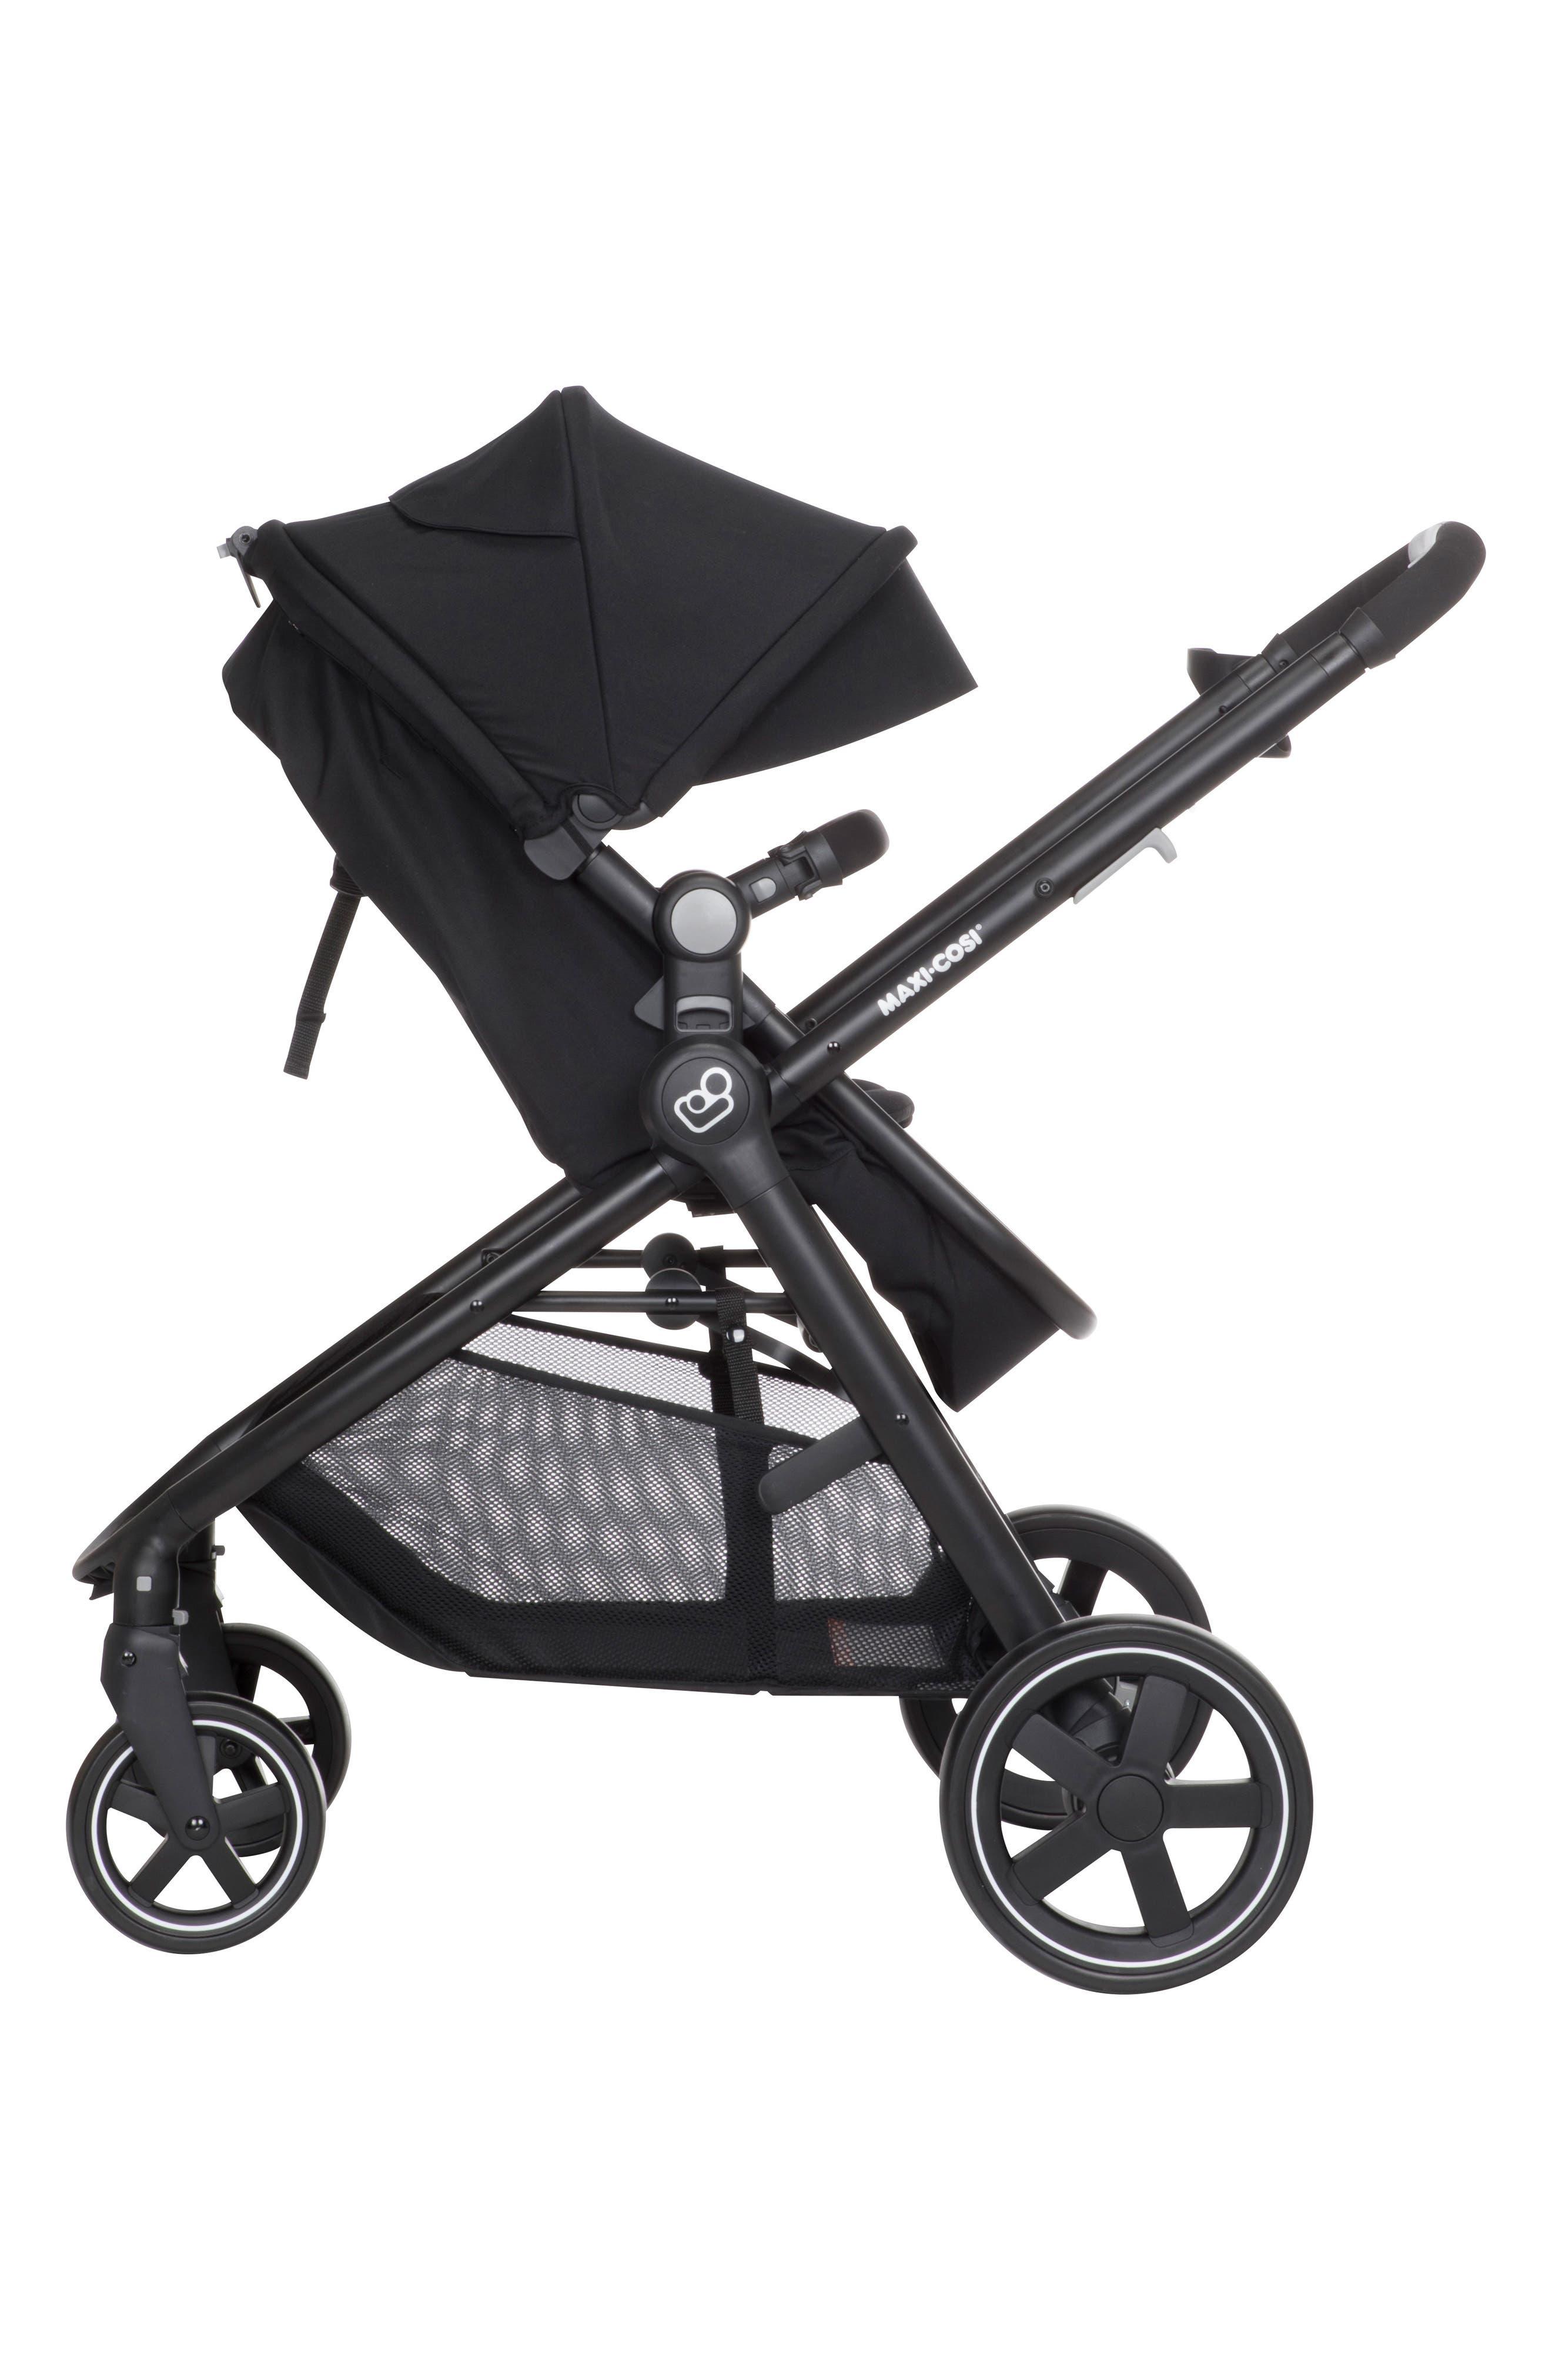 5-1 Mico 30 Infant Car Seat & Zelia Stroller Modular Travel System,                             Alternate thumbnail 10, color,                             NIGHT BLACK